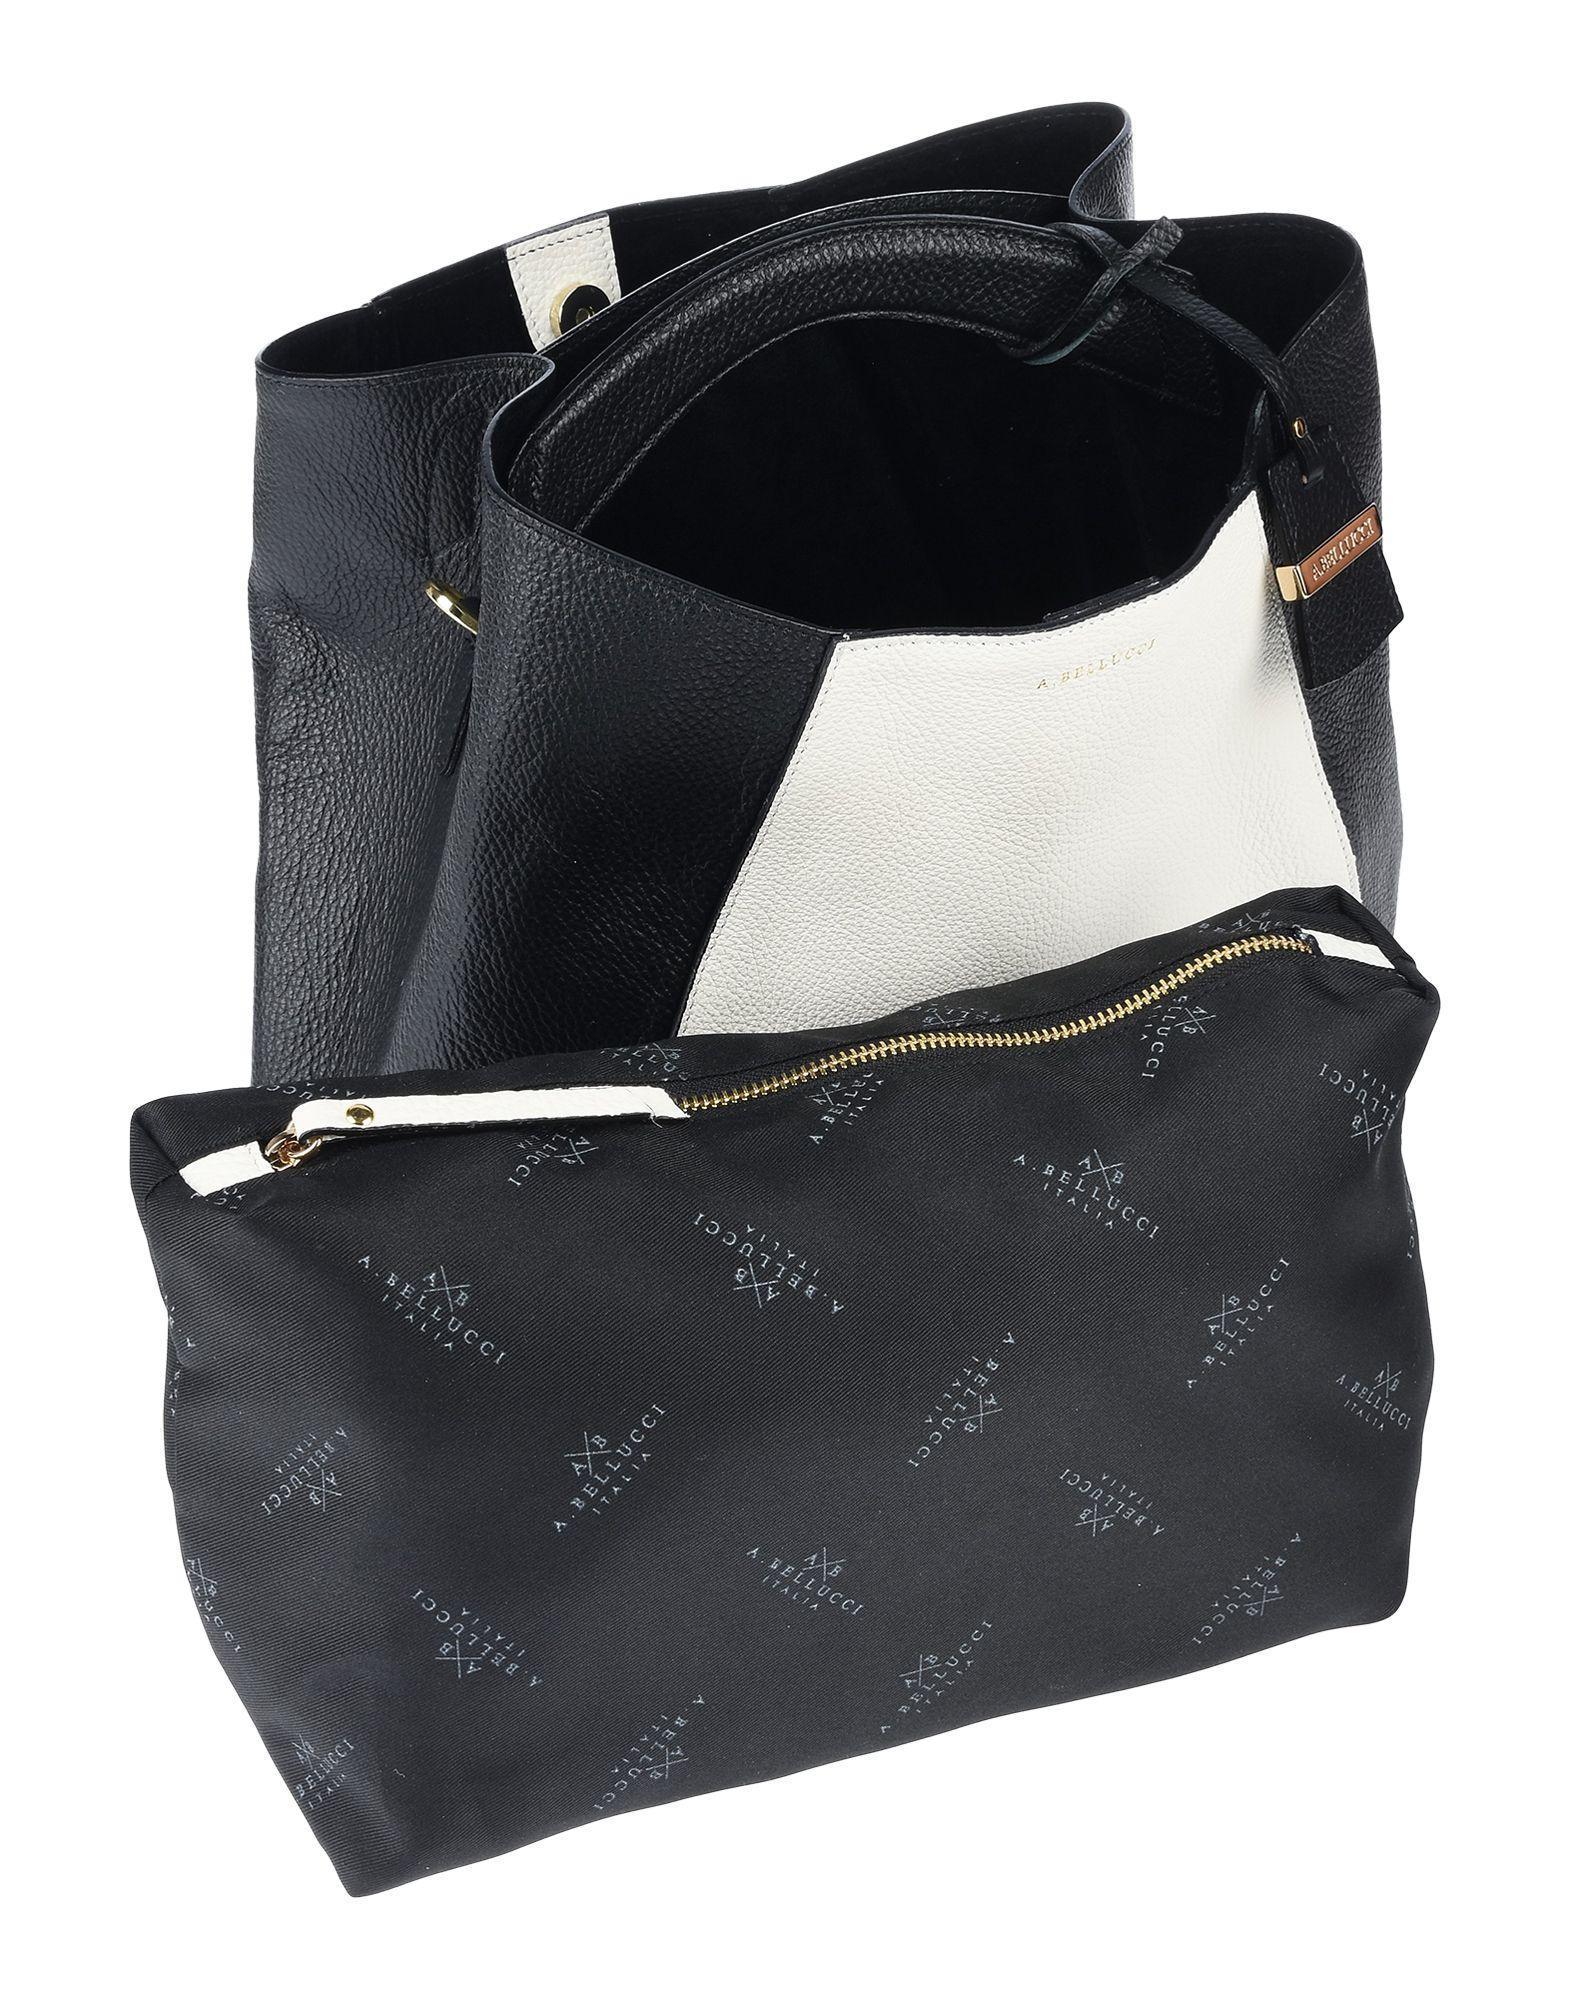 Ab Asia Bellucci Leder Handtaschen in Schwarz 6LeLE